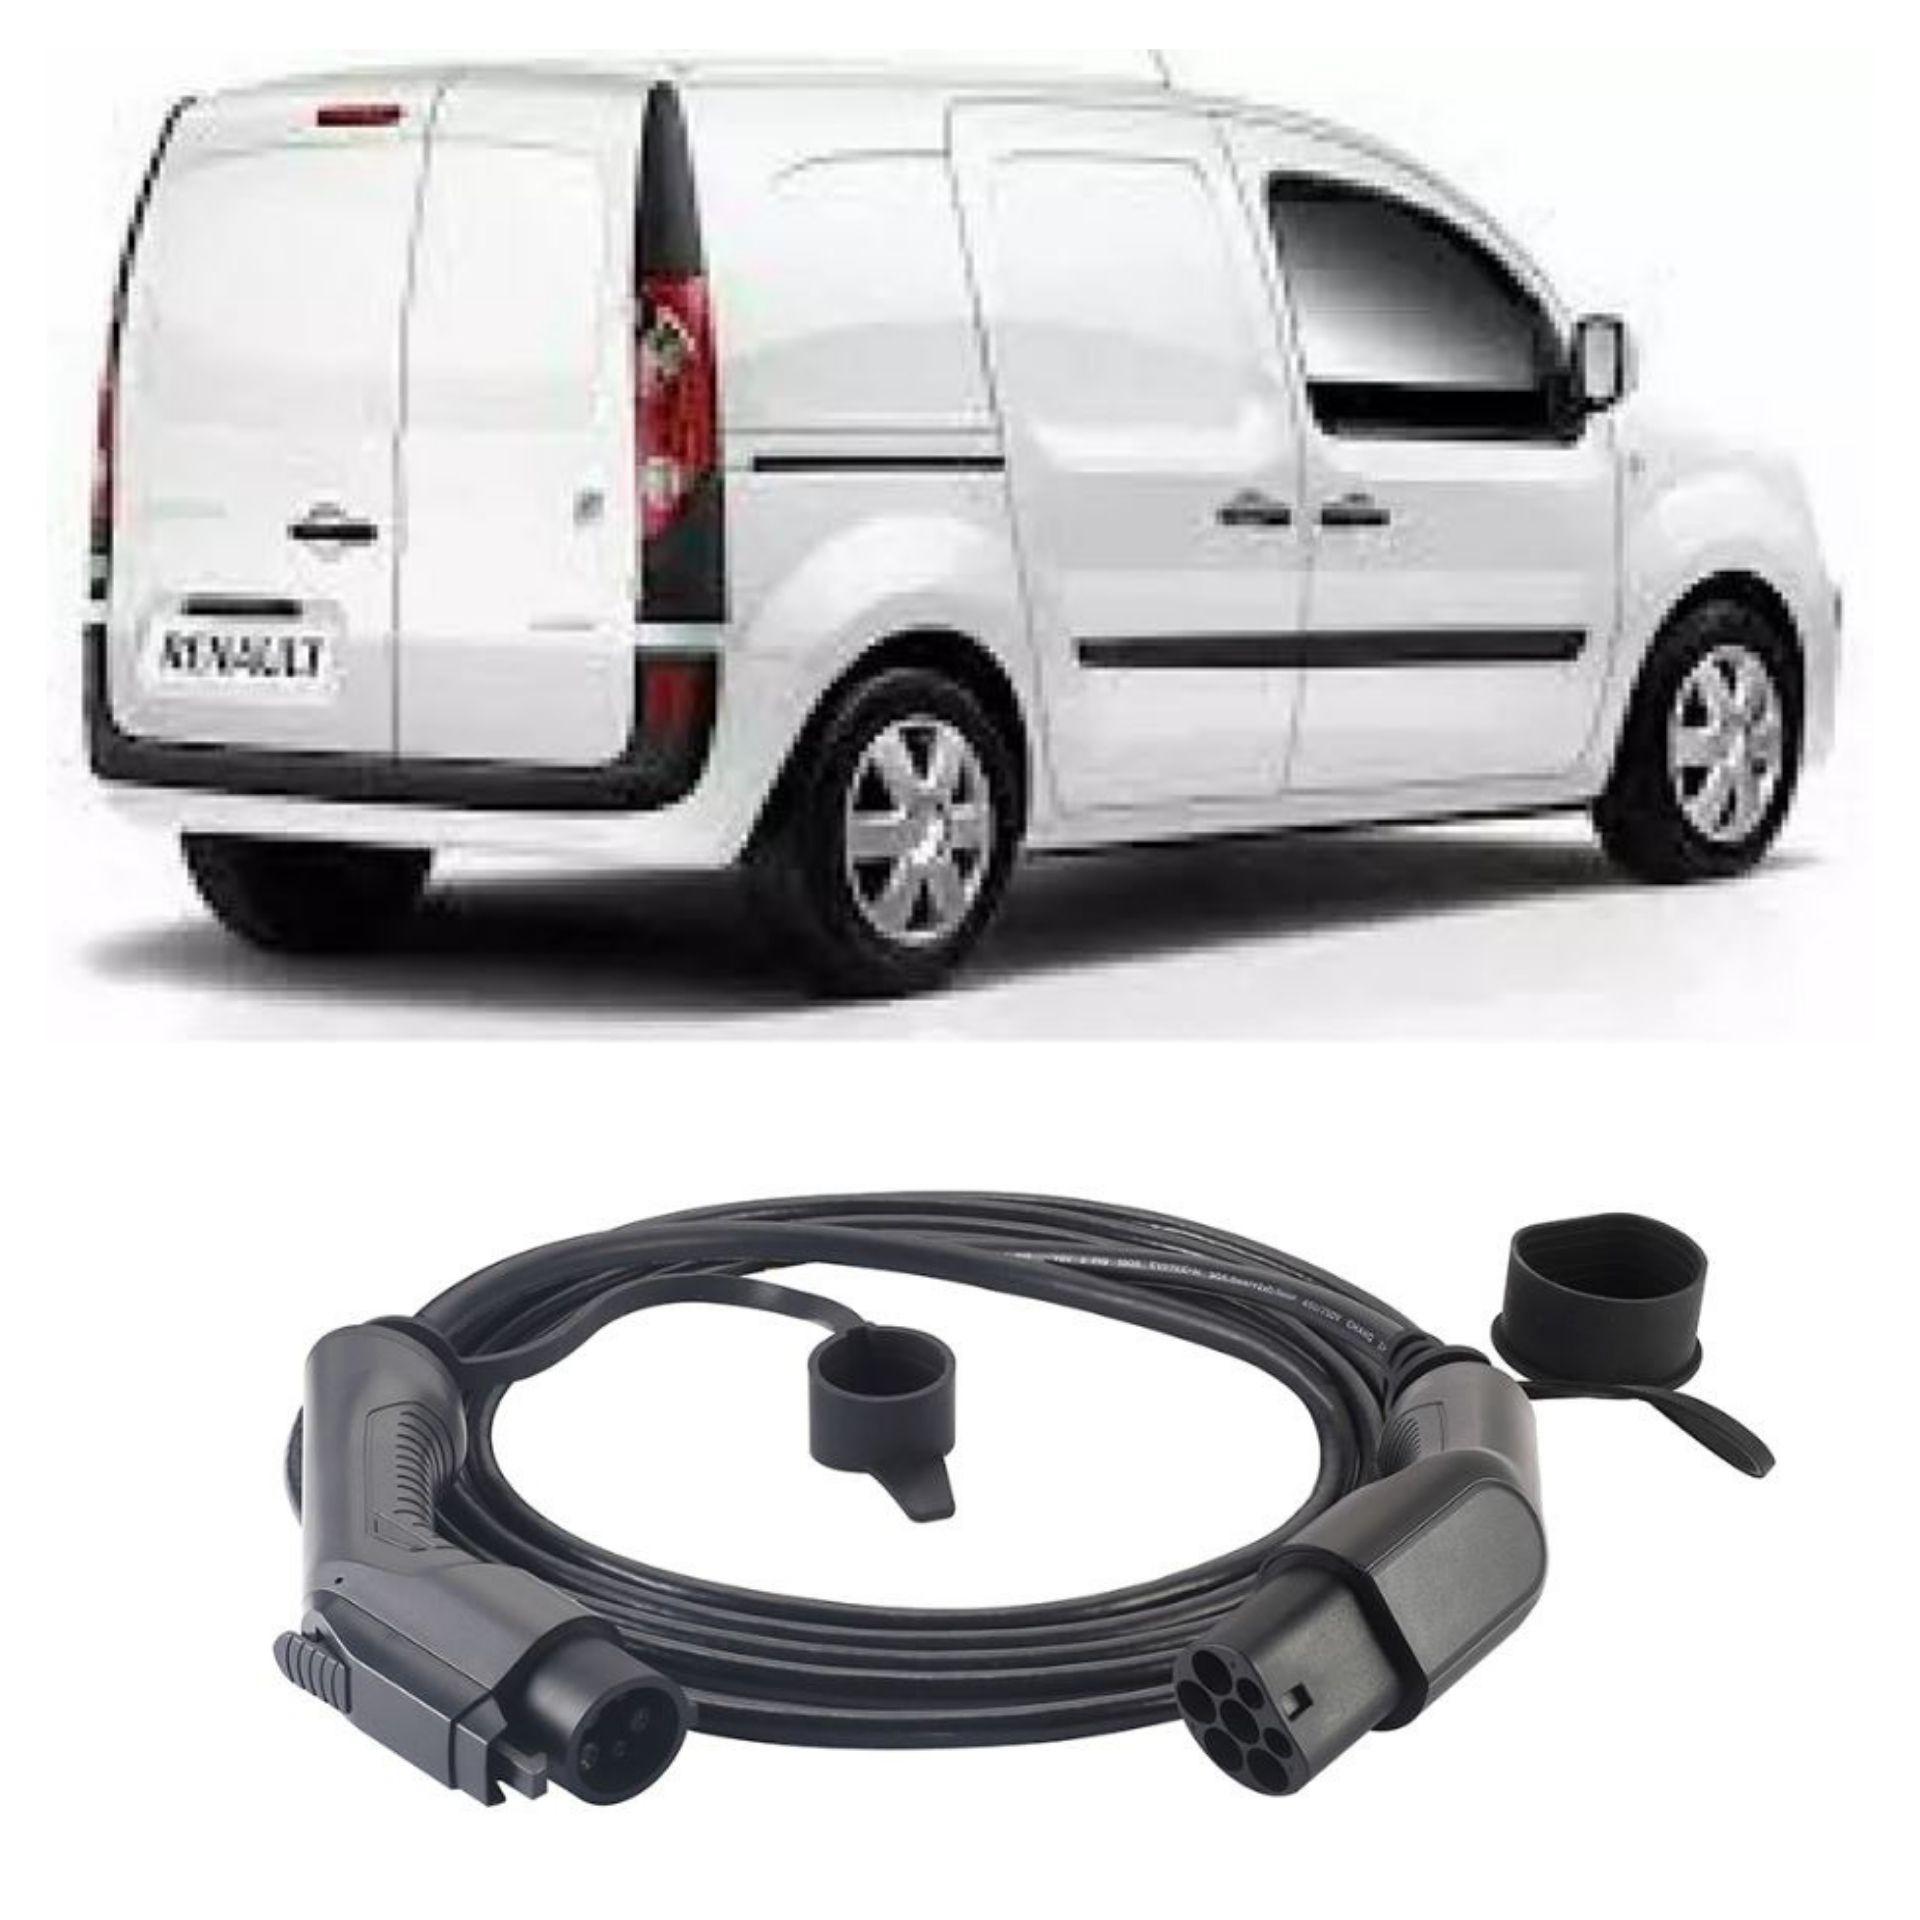 phase 1 Type 2 to Type 1 Renault Kangoo ZE EV Charging Cable 16amp 5m Case